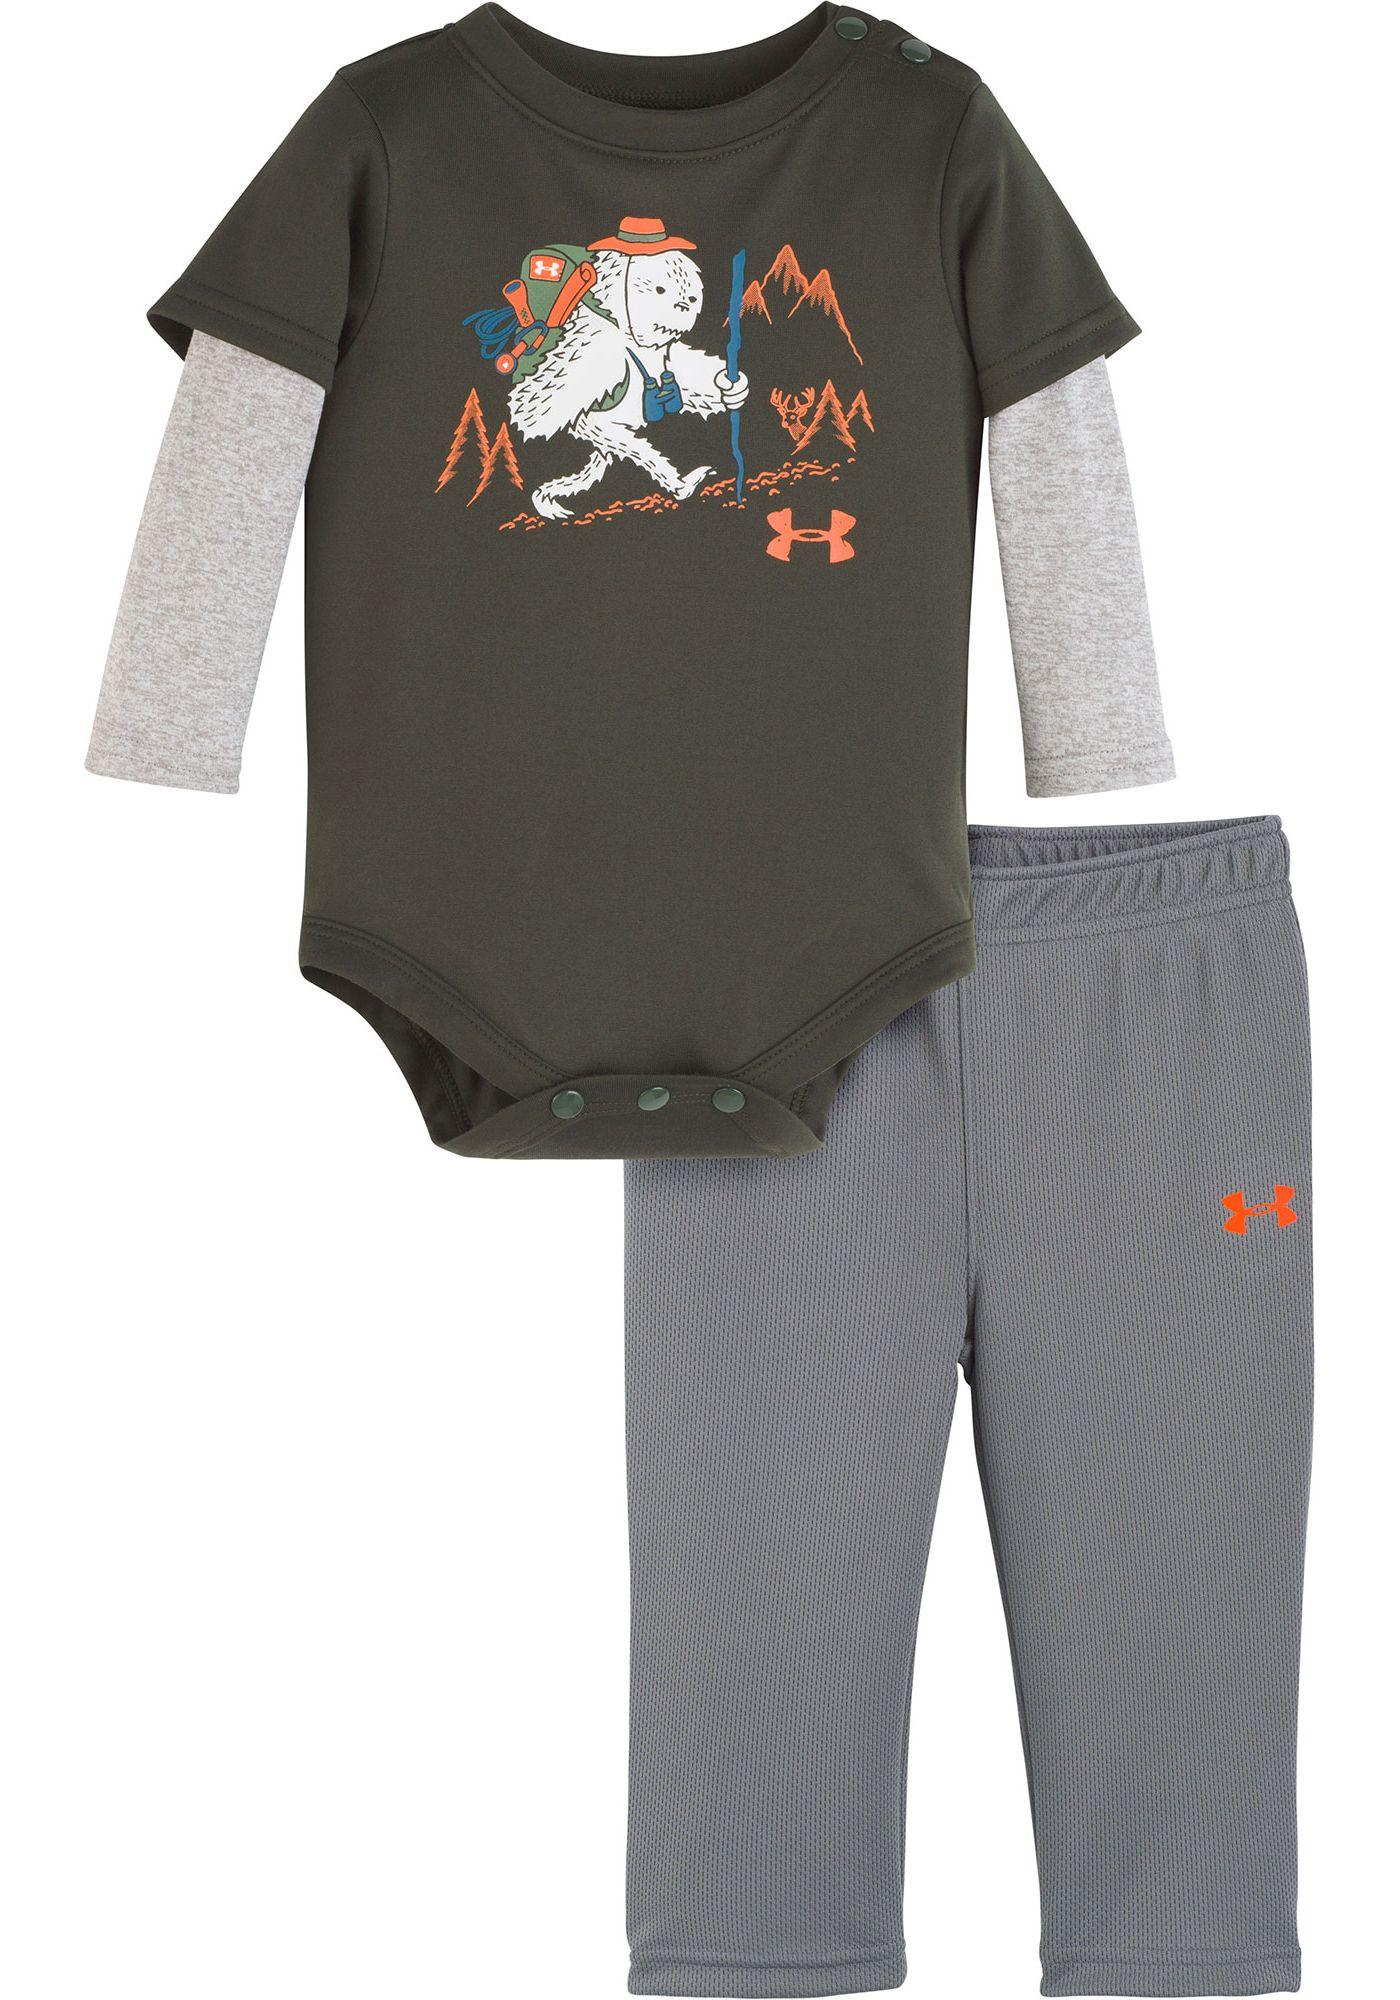 Under Armour Newborn Boys' Yeti Hiker Onesie and Pant Set